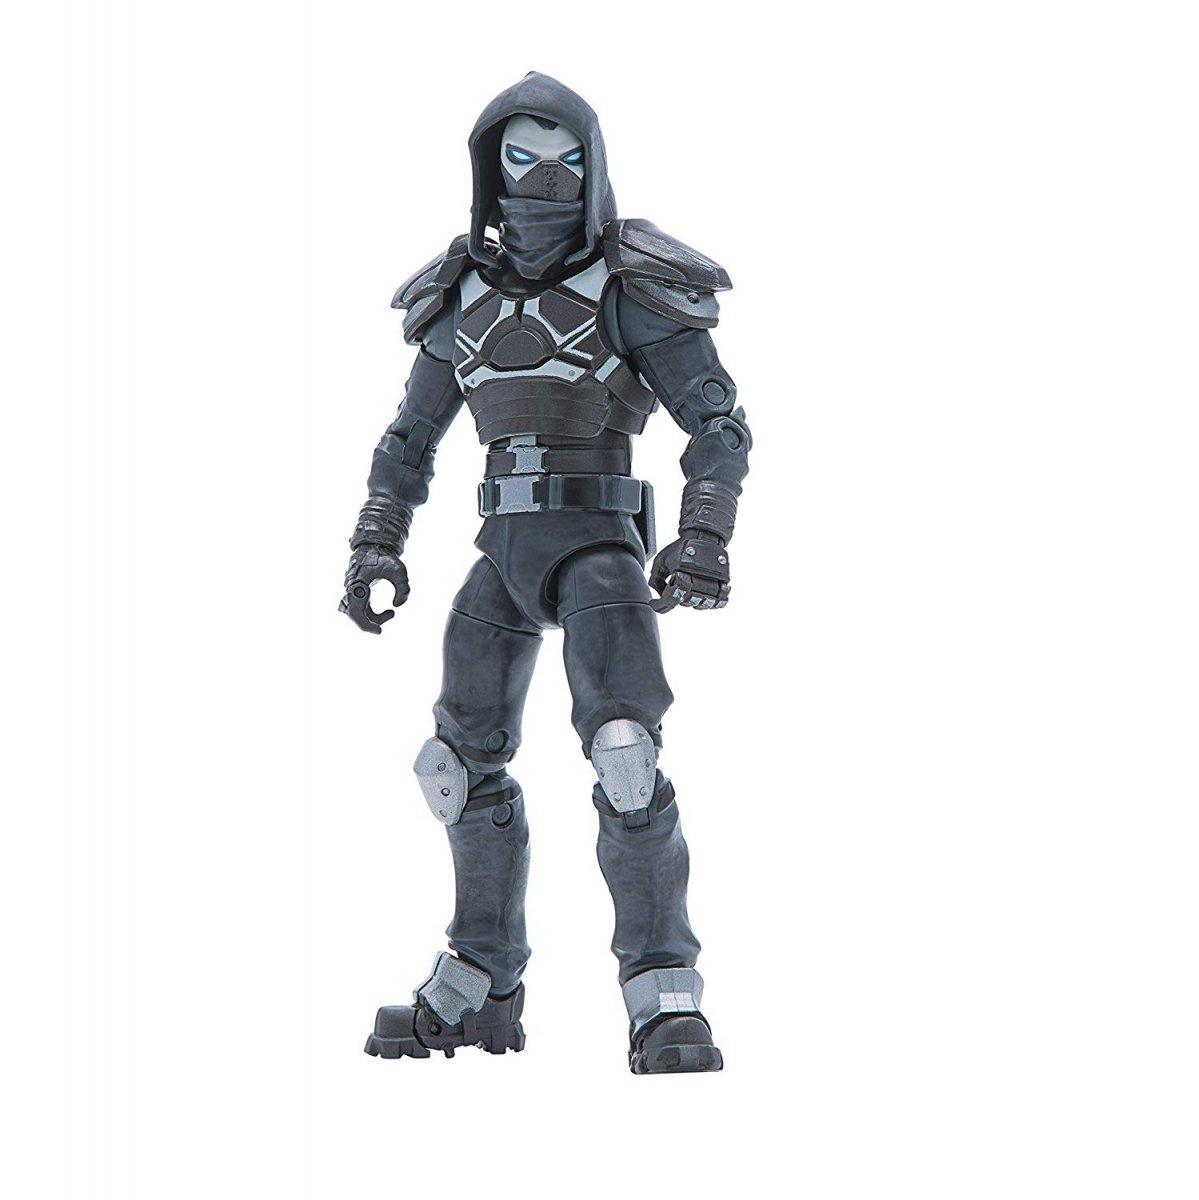 Коллекционная фигурка Fortnite Legendary Series Enforcer (FNT0061) фото